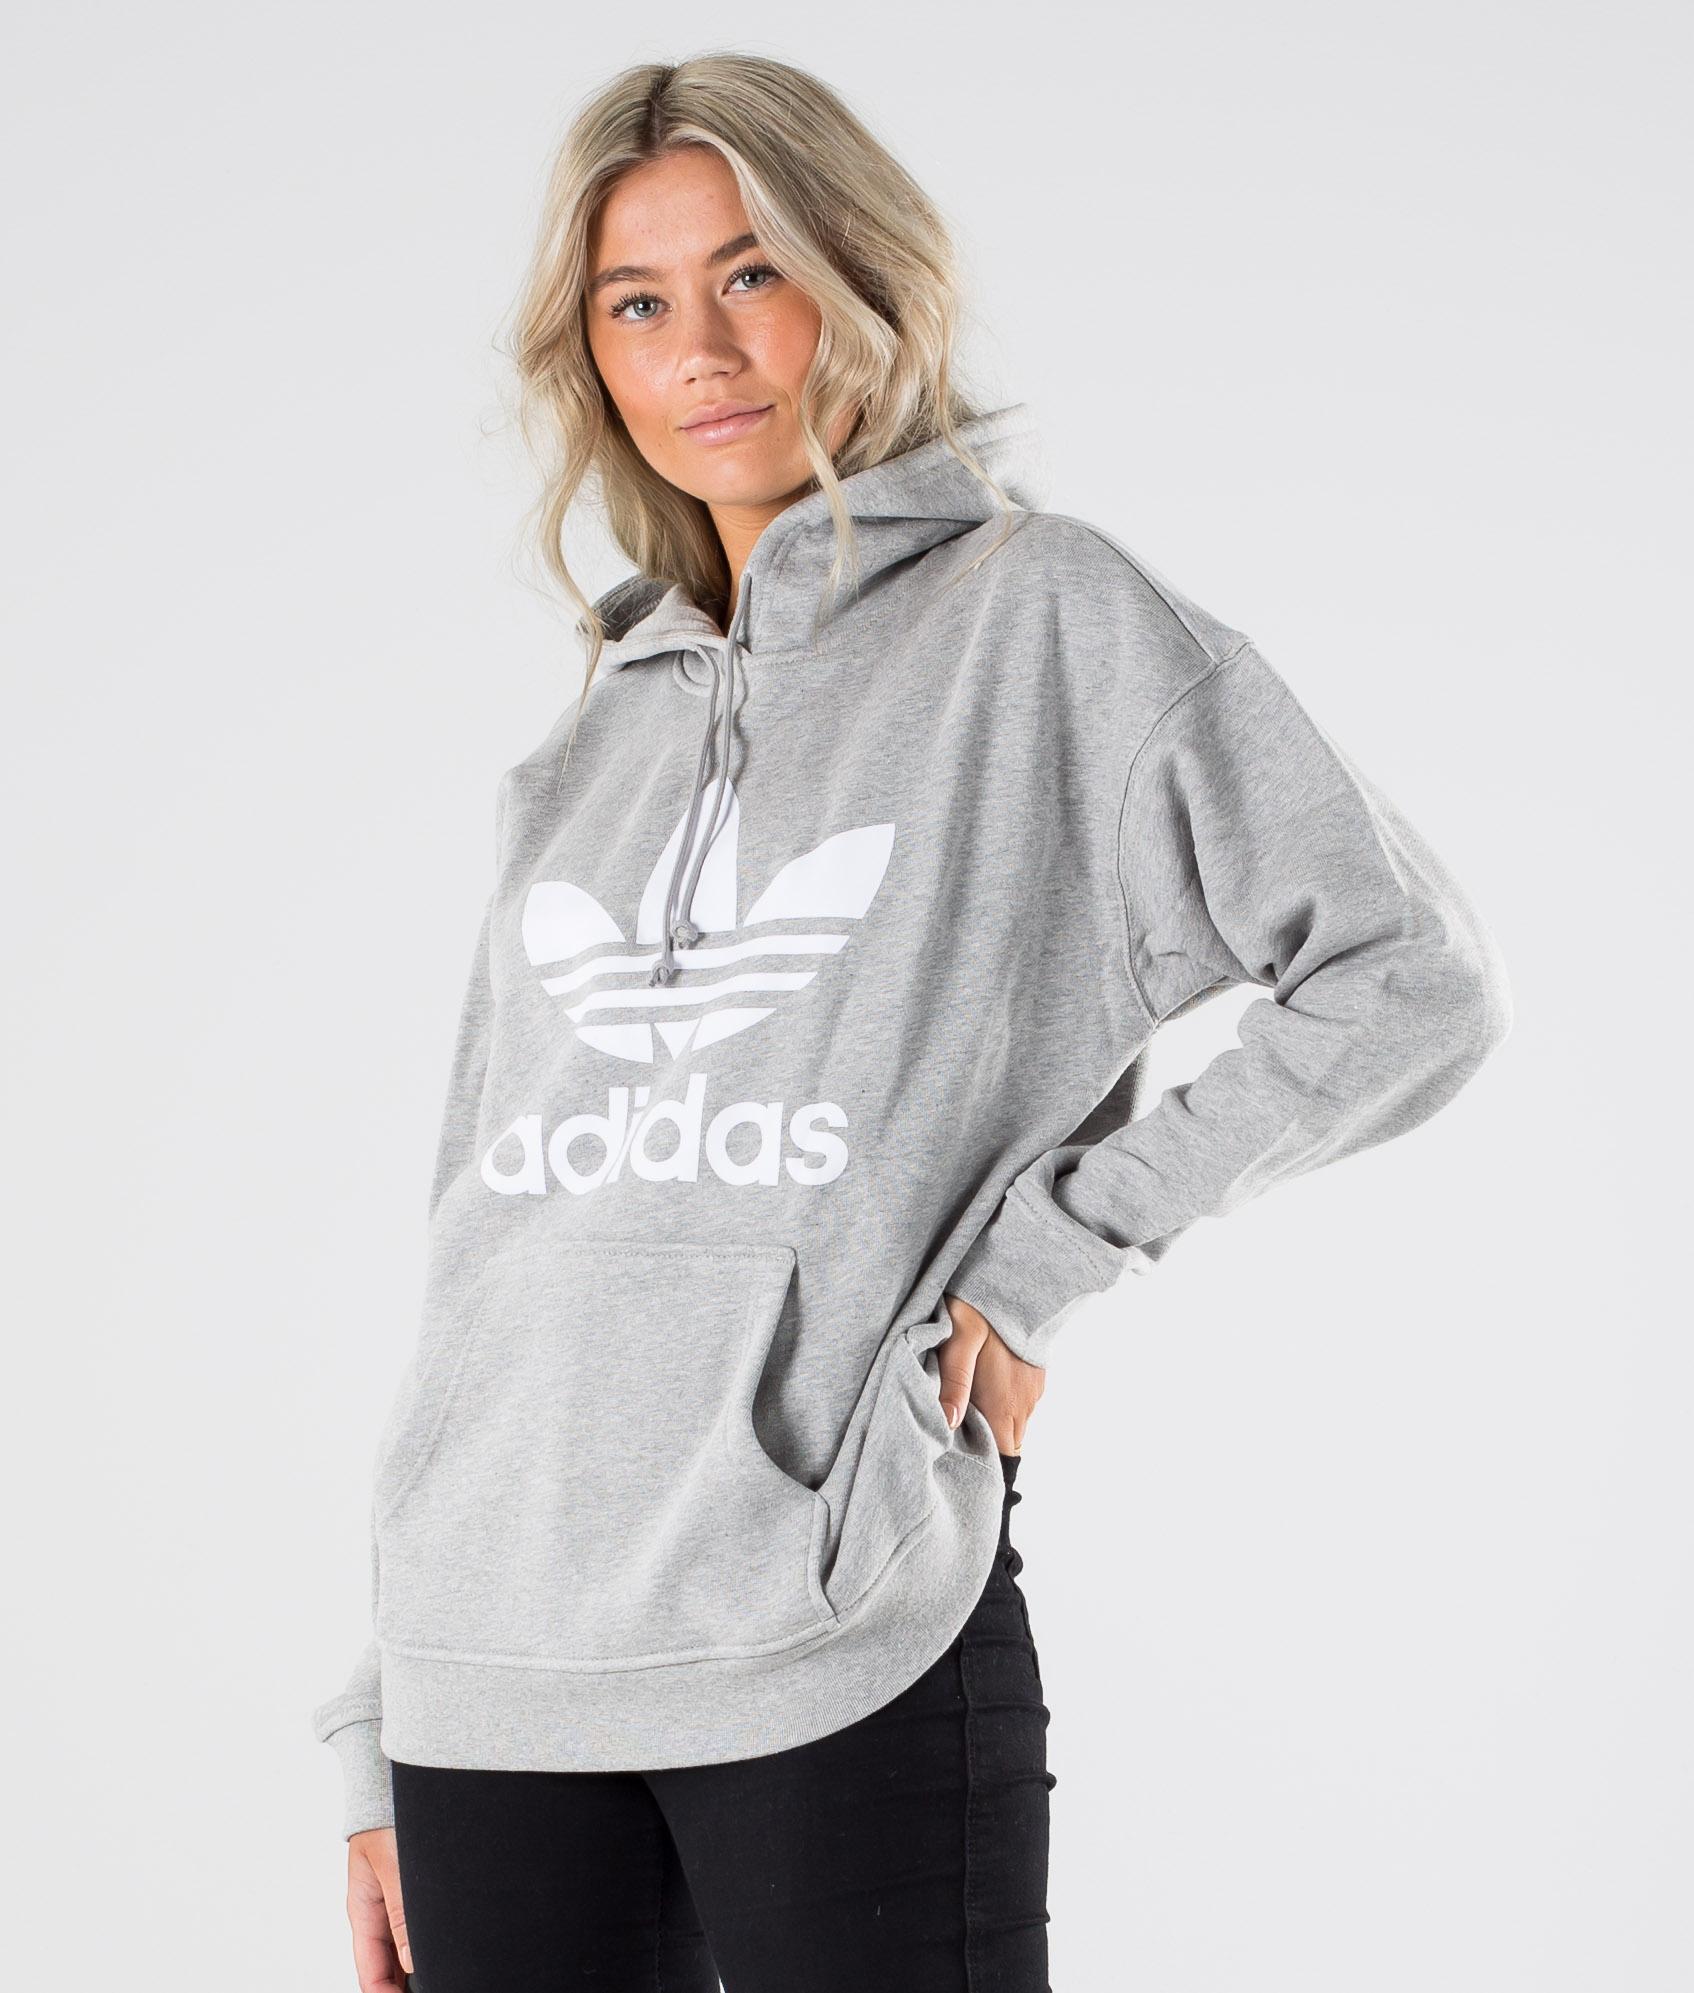 Adidas Originals Trefoil Hoodie Hood Medium Grey HeatherWhite